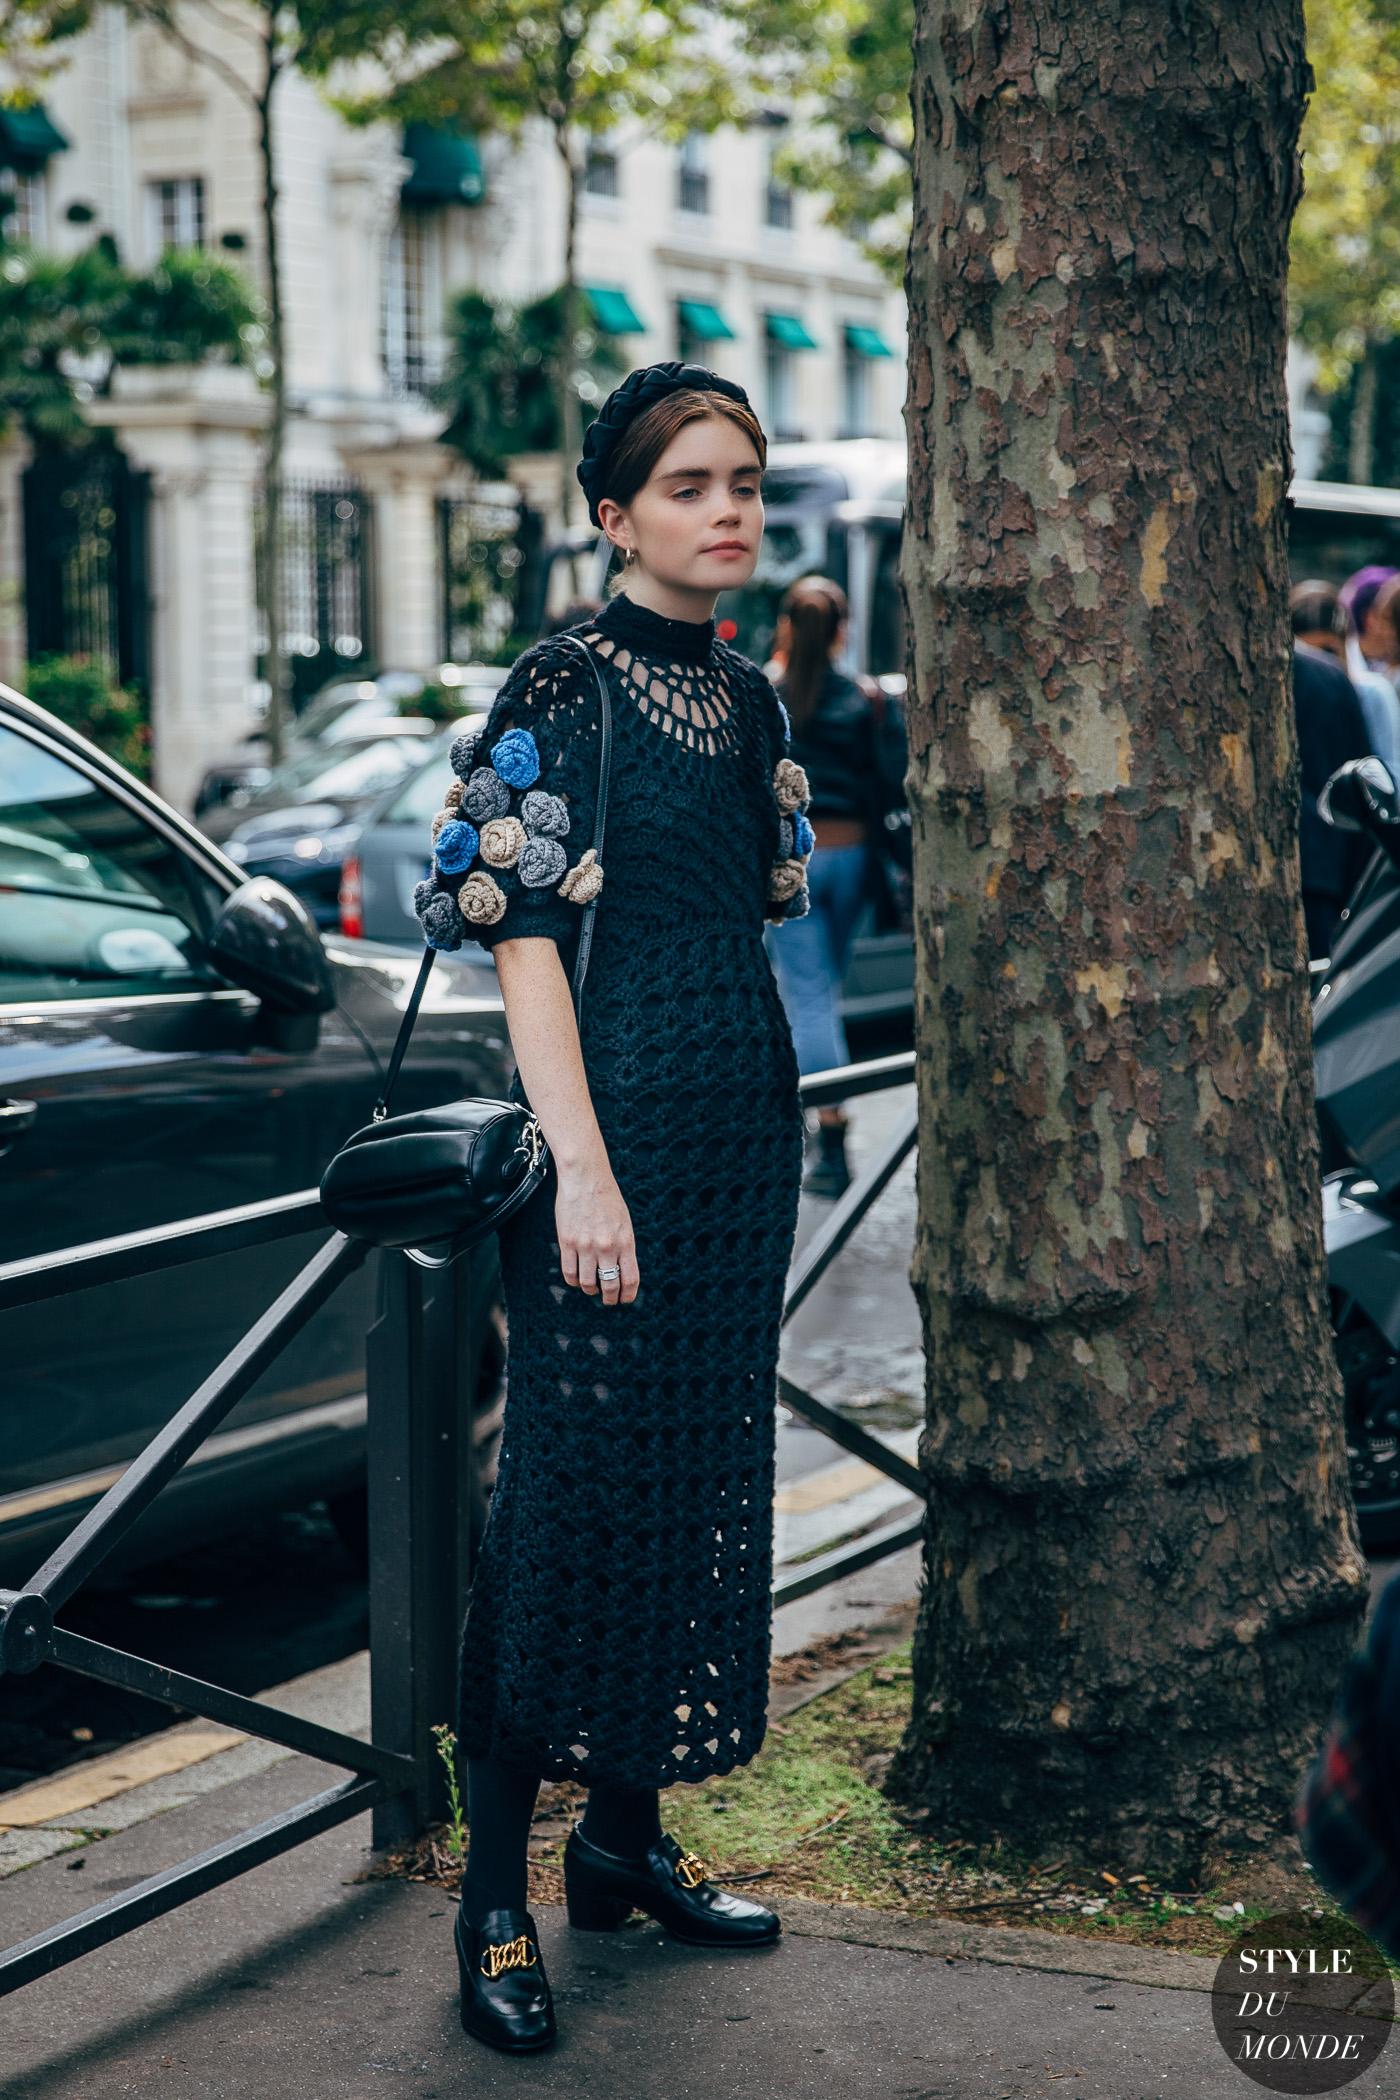 Paris SS 2020 Street Style: Reese Blutstein